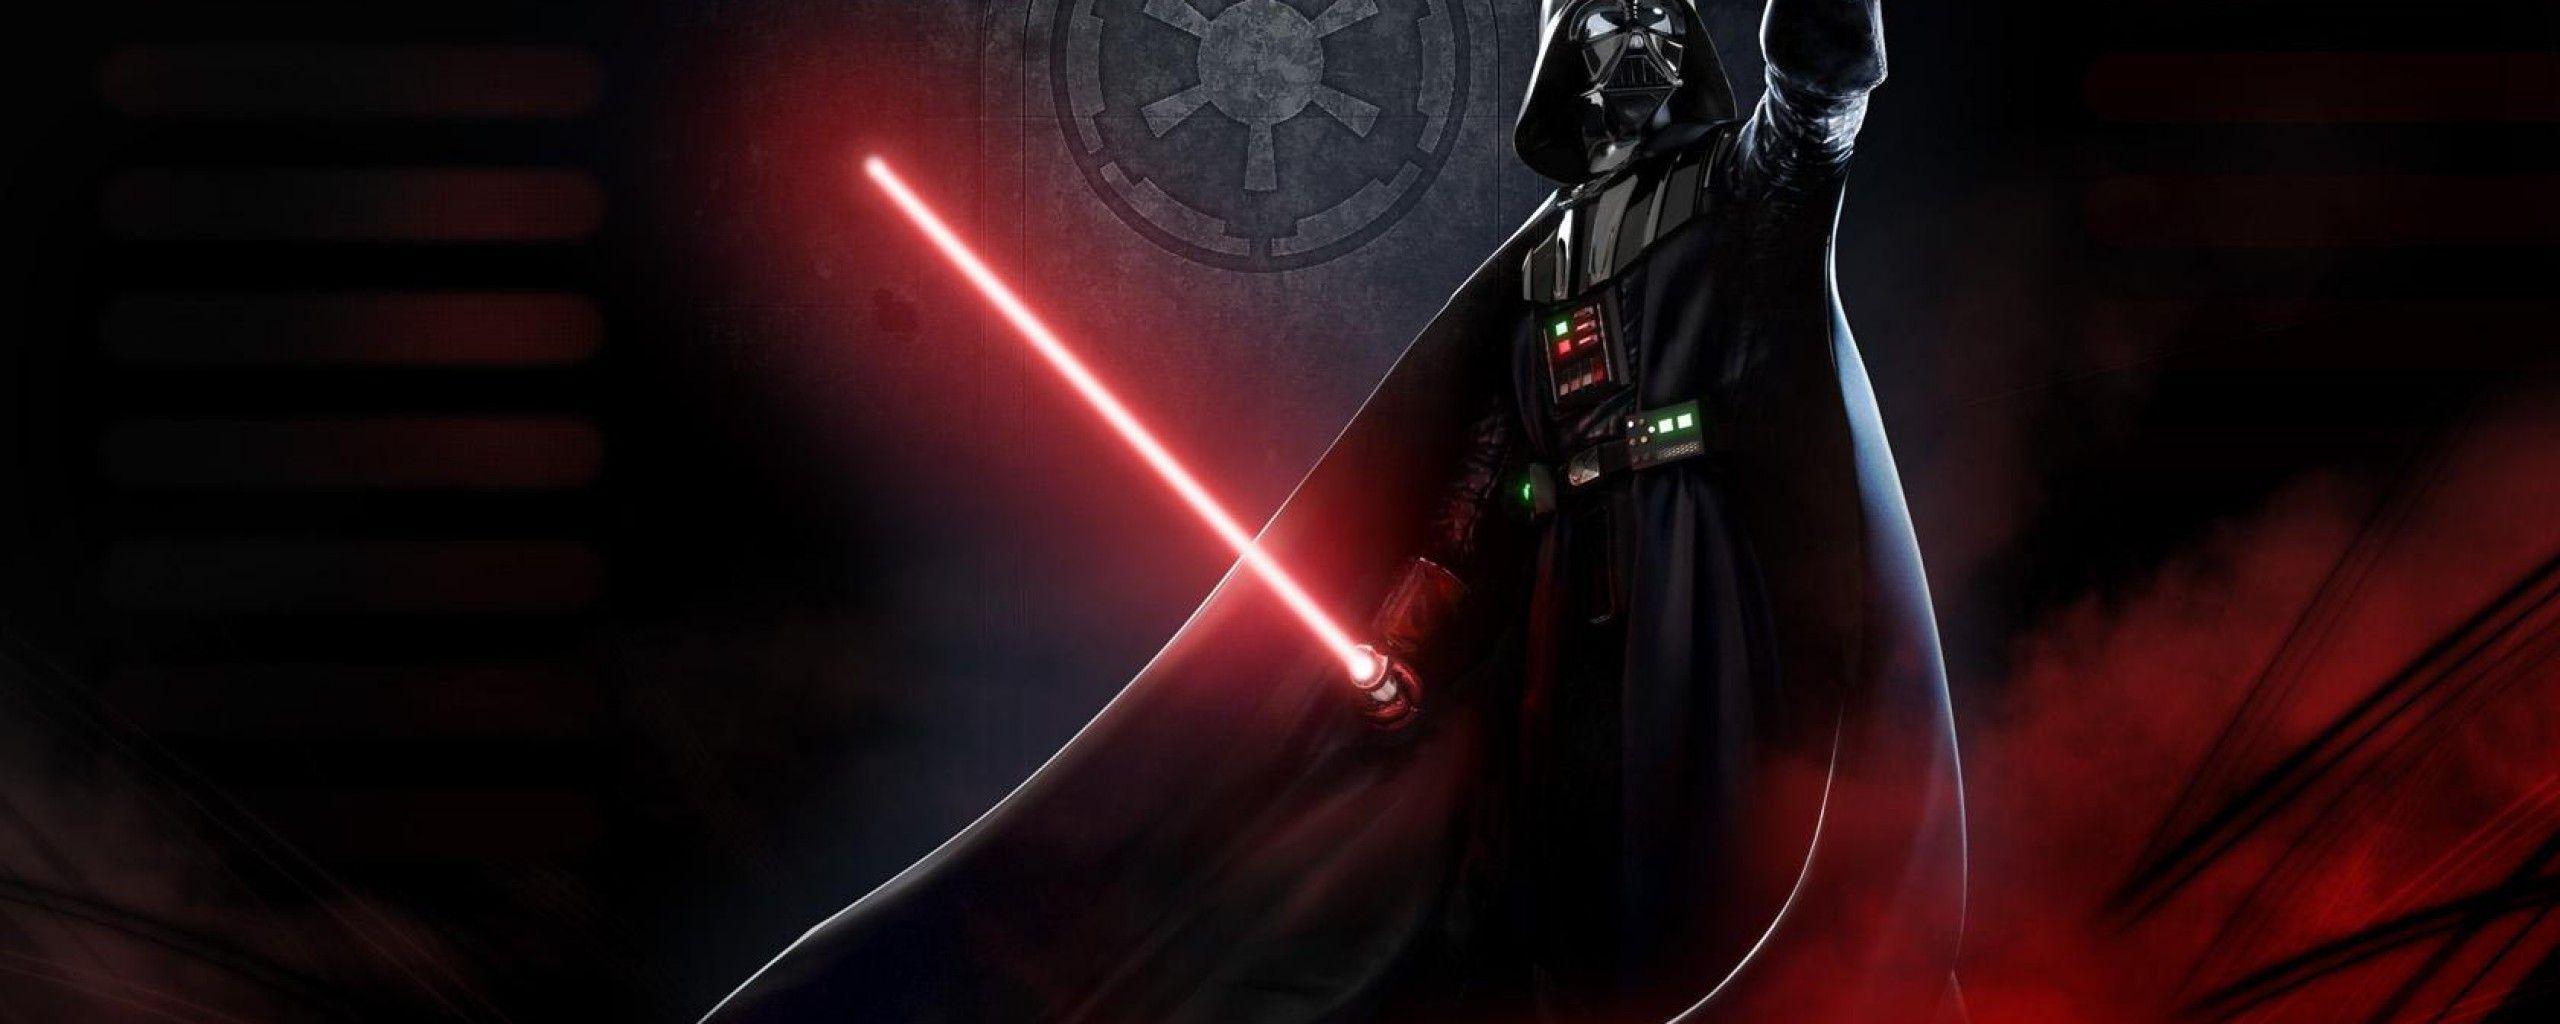 Star Wars Lightsaber Duel Wallpapers Wallpaper Cave